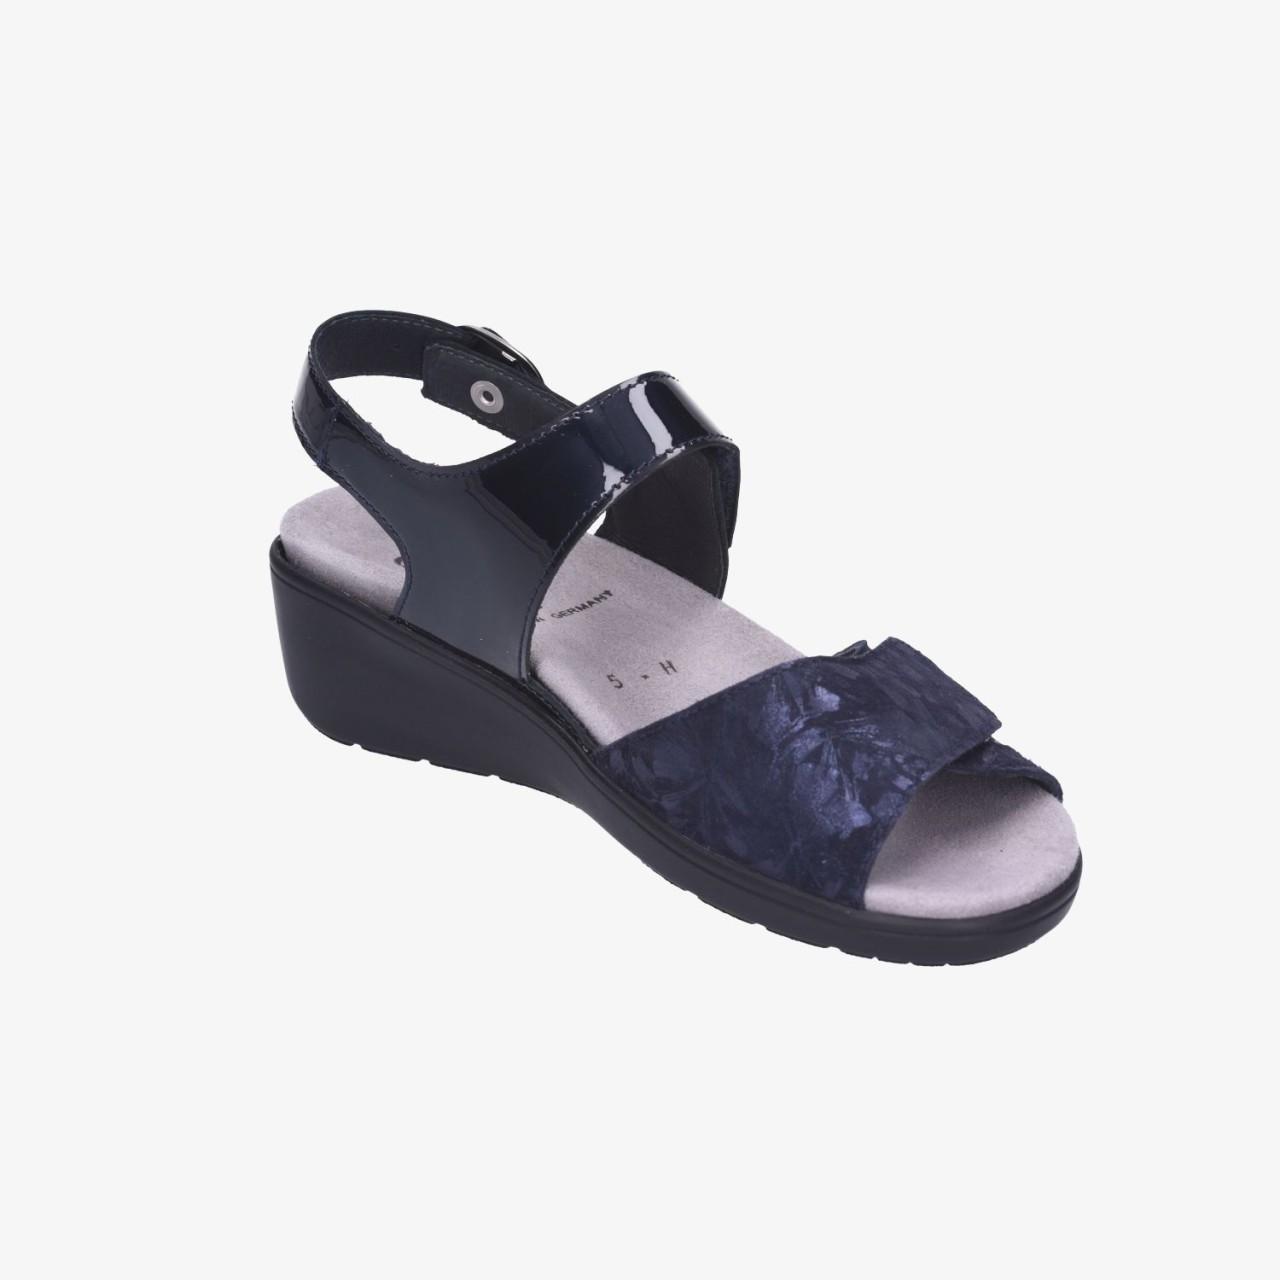 Ramona Semler Semler Komfort blau blau Sandalen Sandalen blau Komfort Bq1Zrw0qA